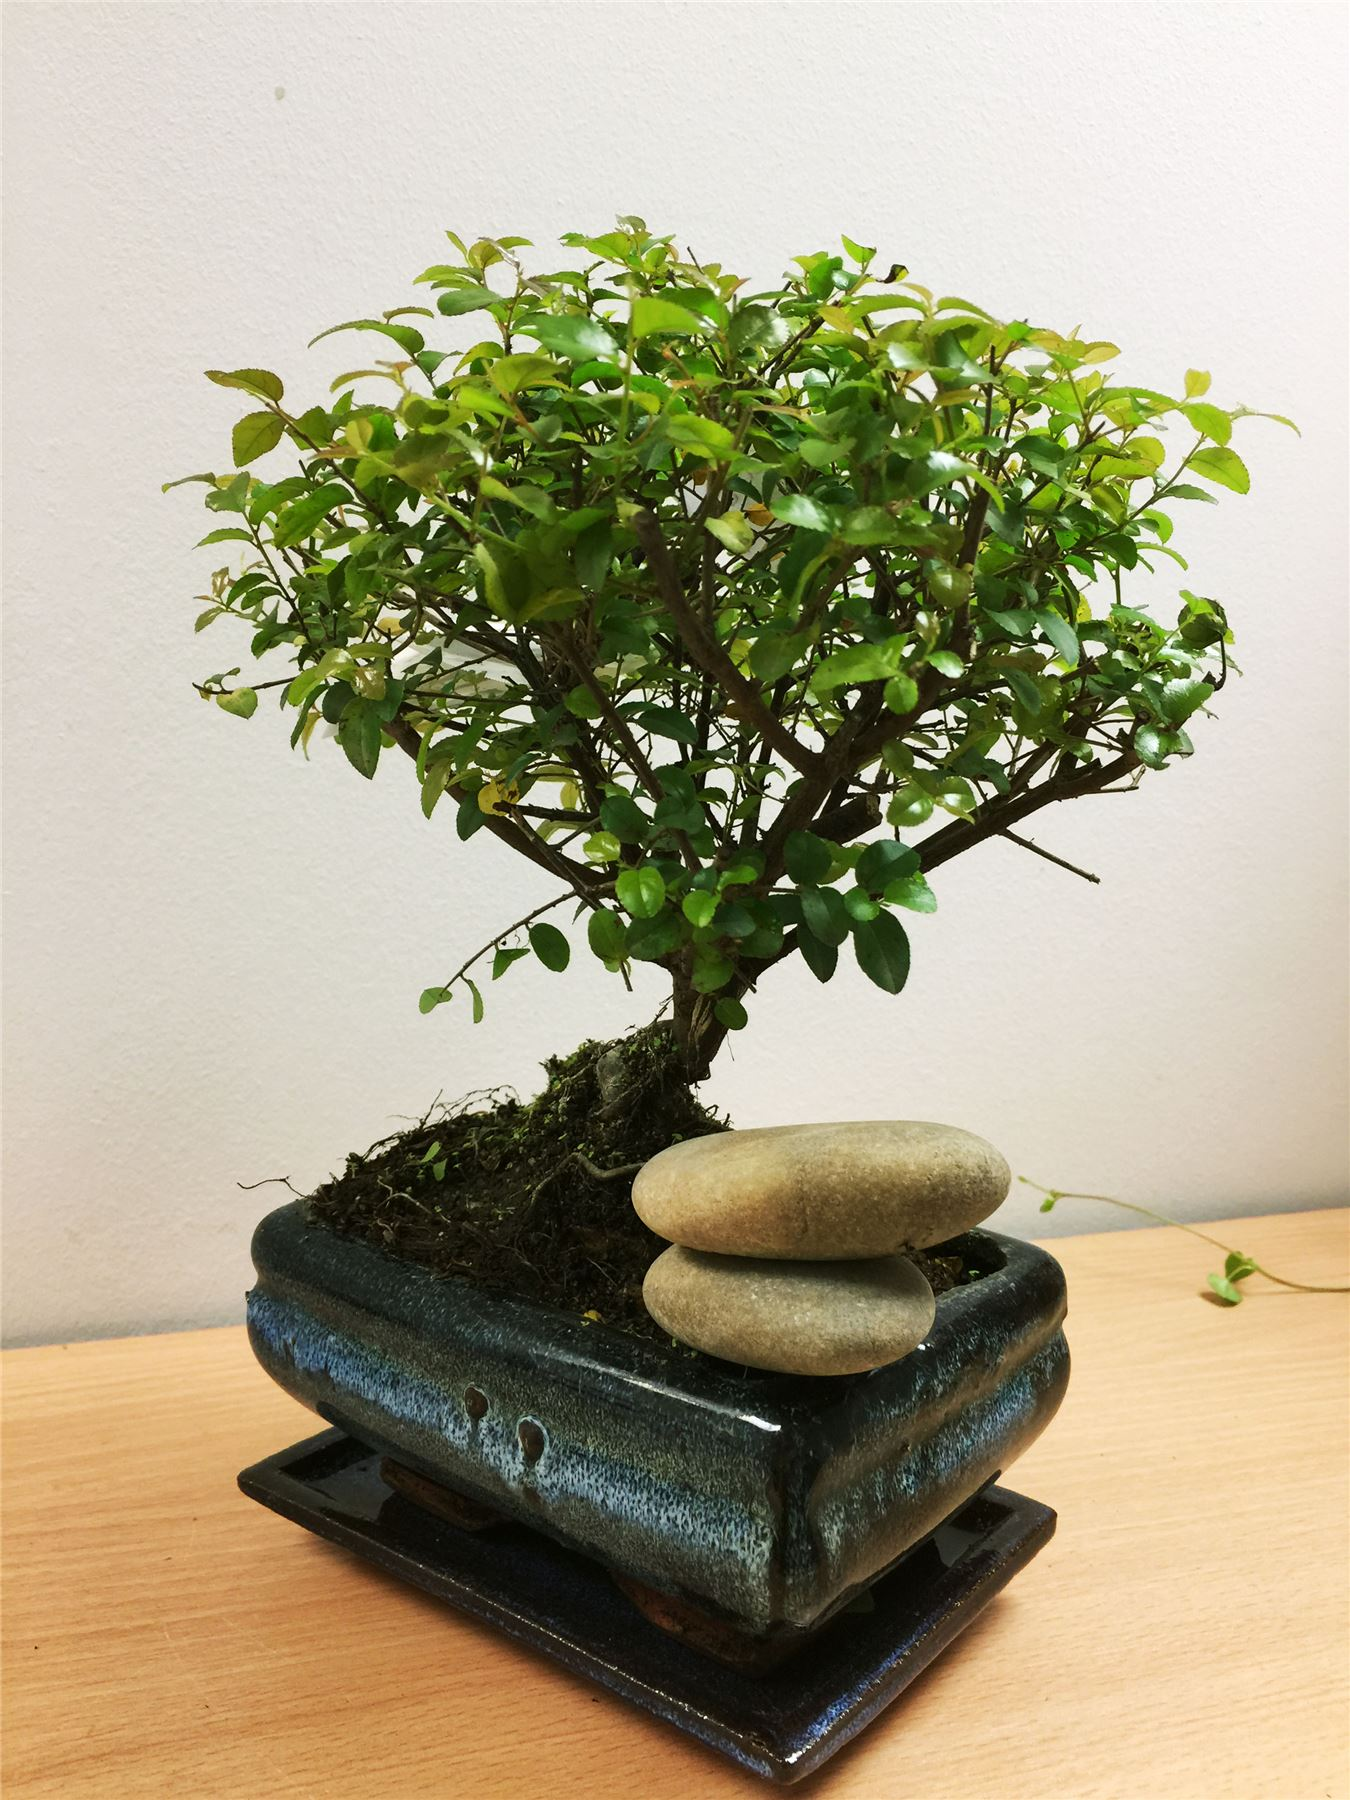 Interni-Esterni-bonsai-IN-VASO-ALBA-Redwood-Foresta-GRUPPO-IMPIANTO-Podocarpus-Yew-Pine